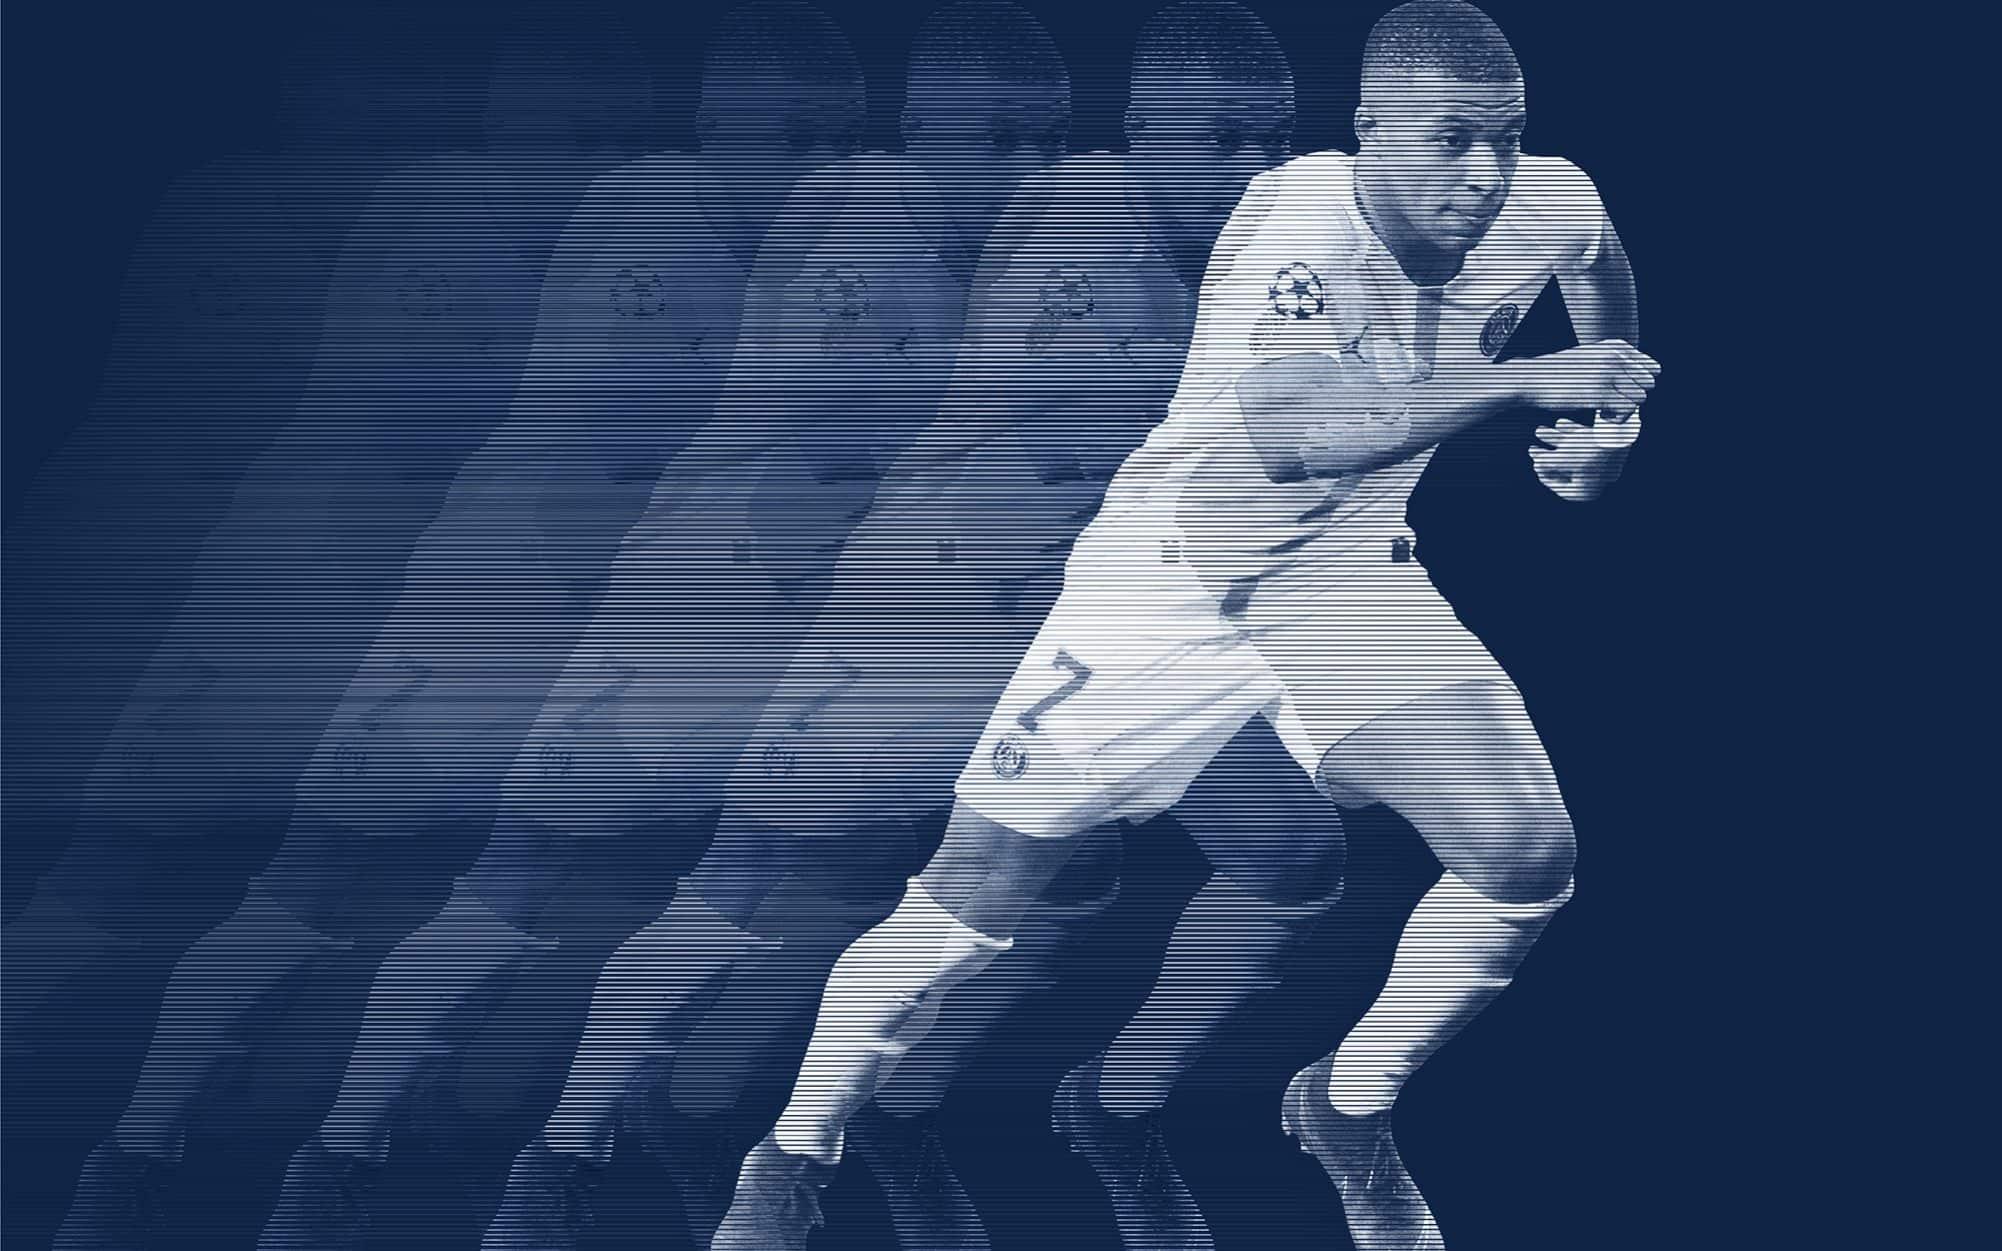 Kylian Mbappe对曼联的迅速掏空强调了足球对节奏的